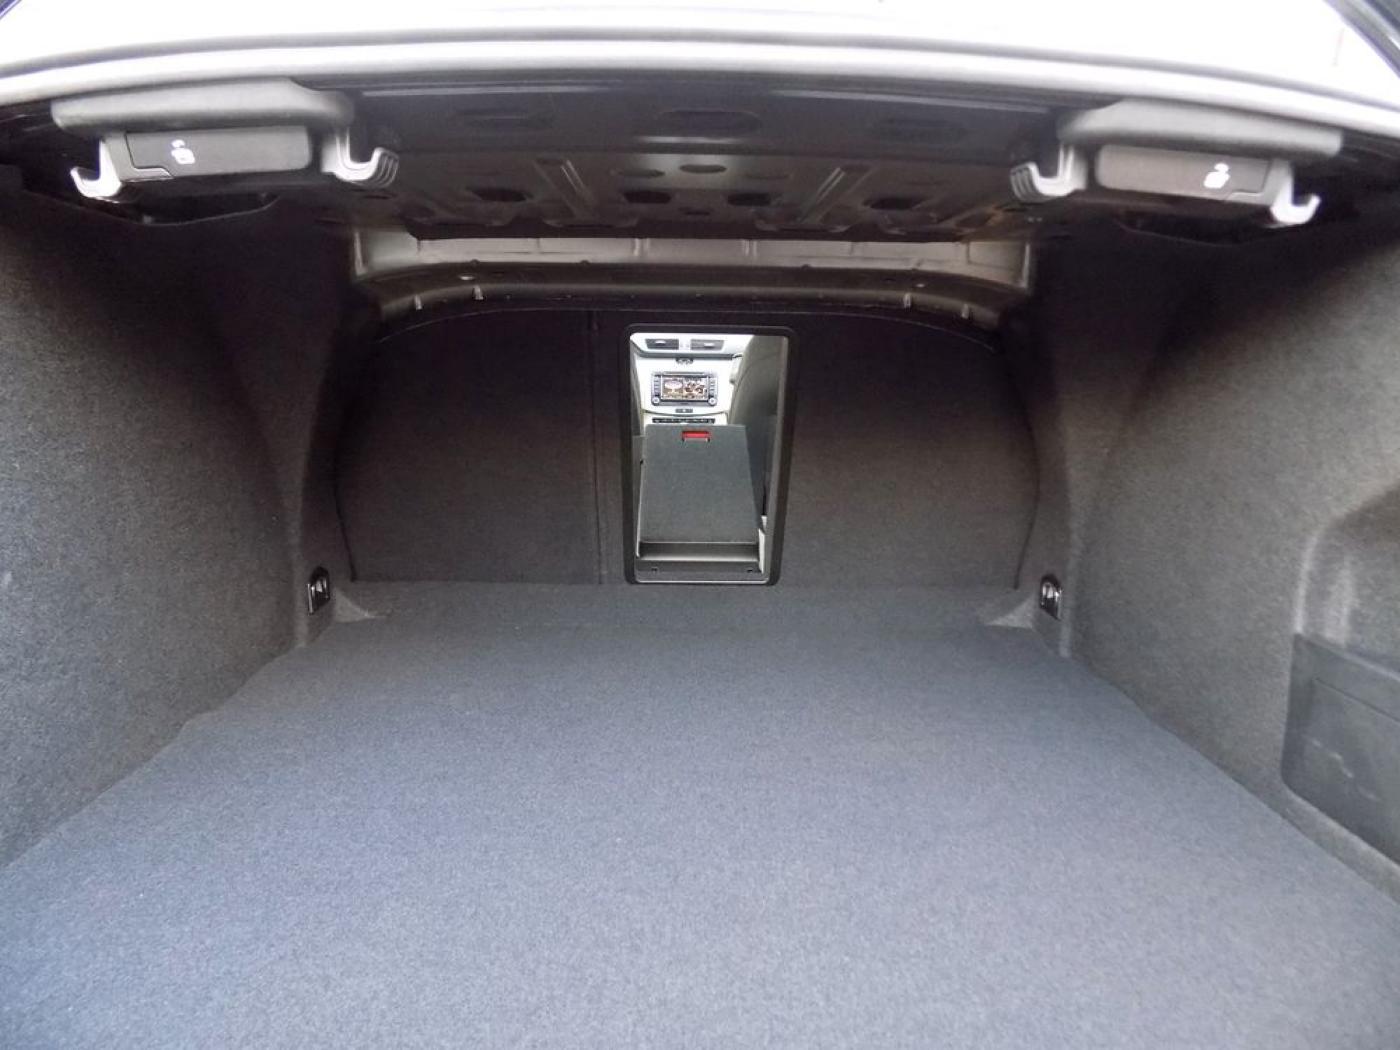 Volkswagen CC 2.0 TDi Highline Xenon  DSG 4x4